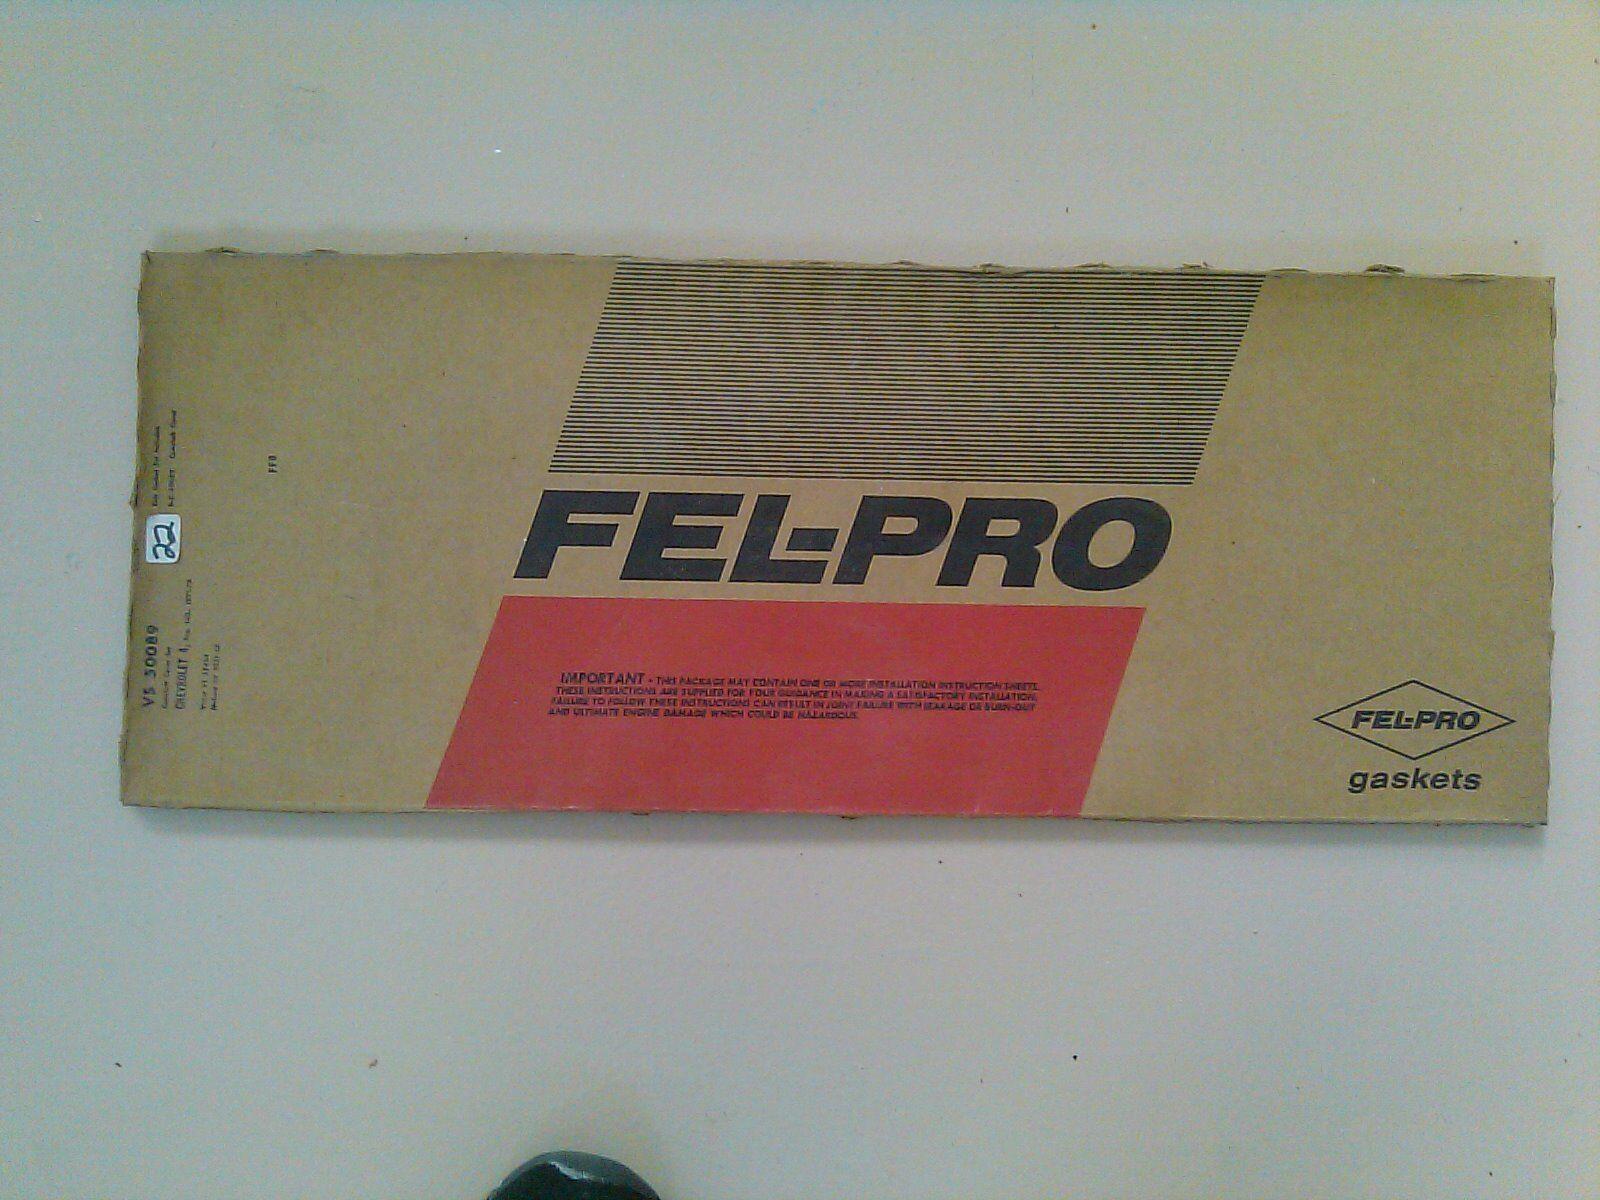 Fel Pro Camshaft Gasket Set  VS 50089  - 1971-73 Chevy 4